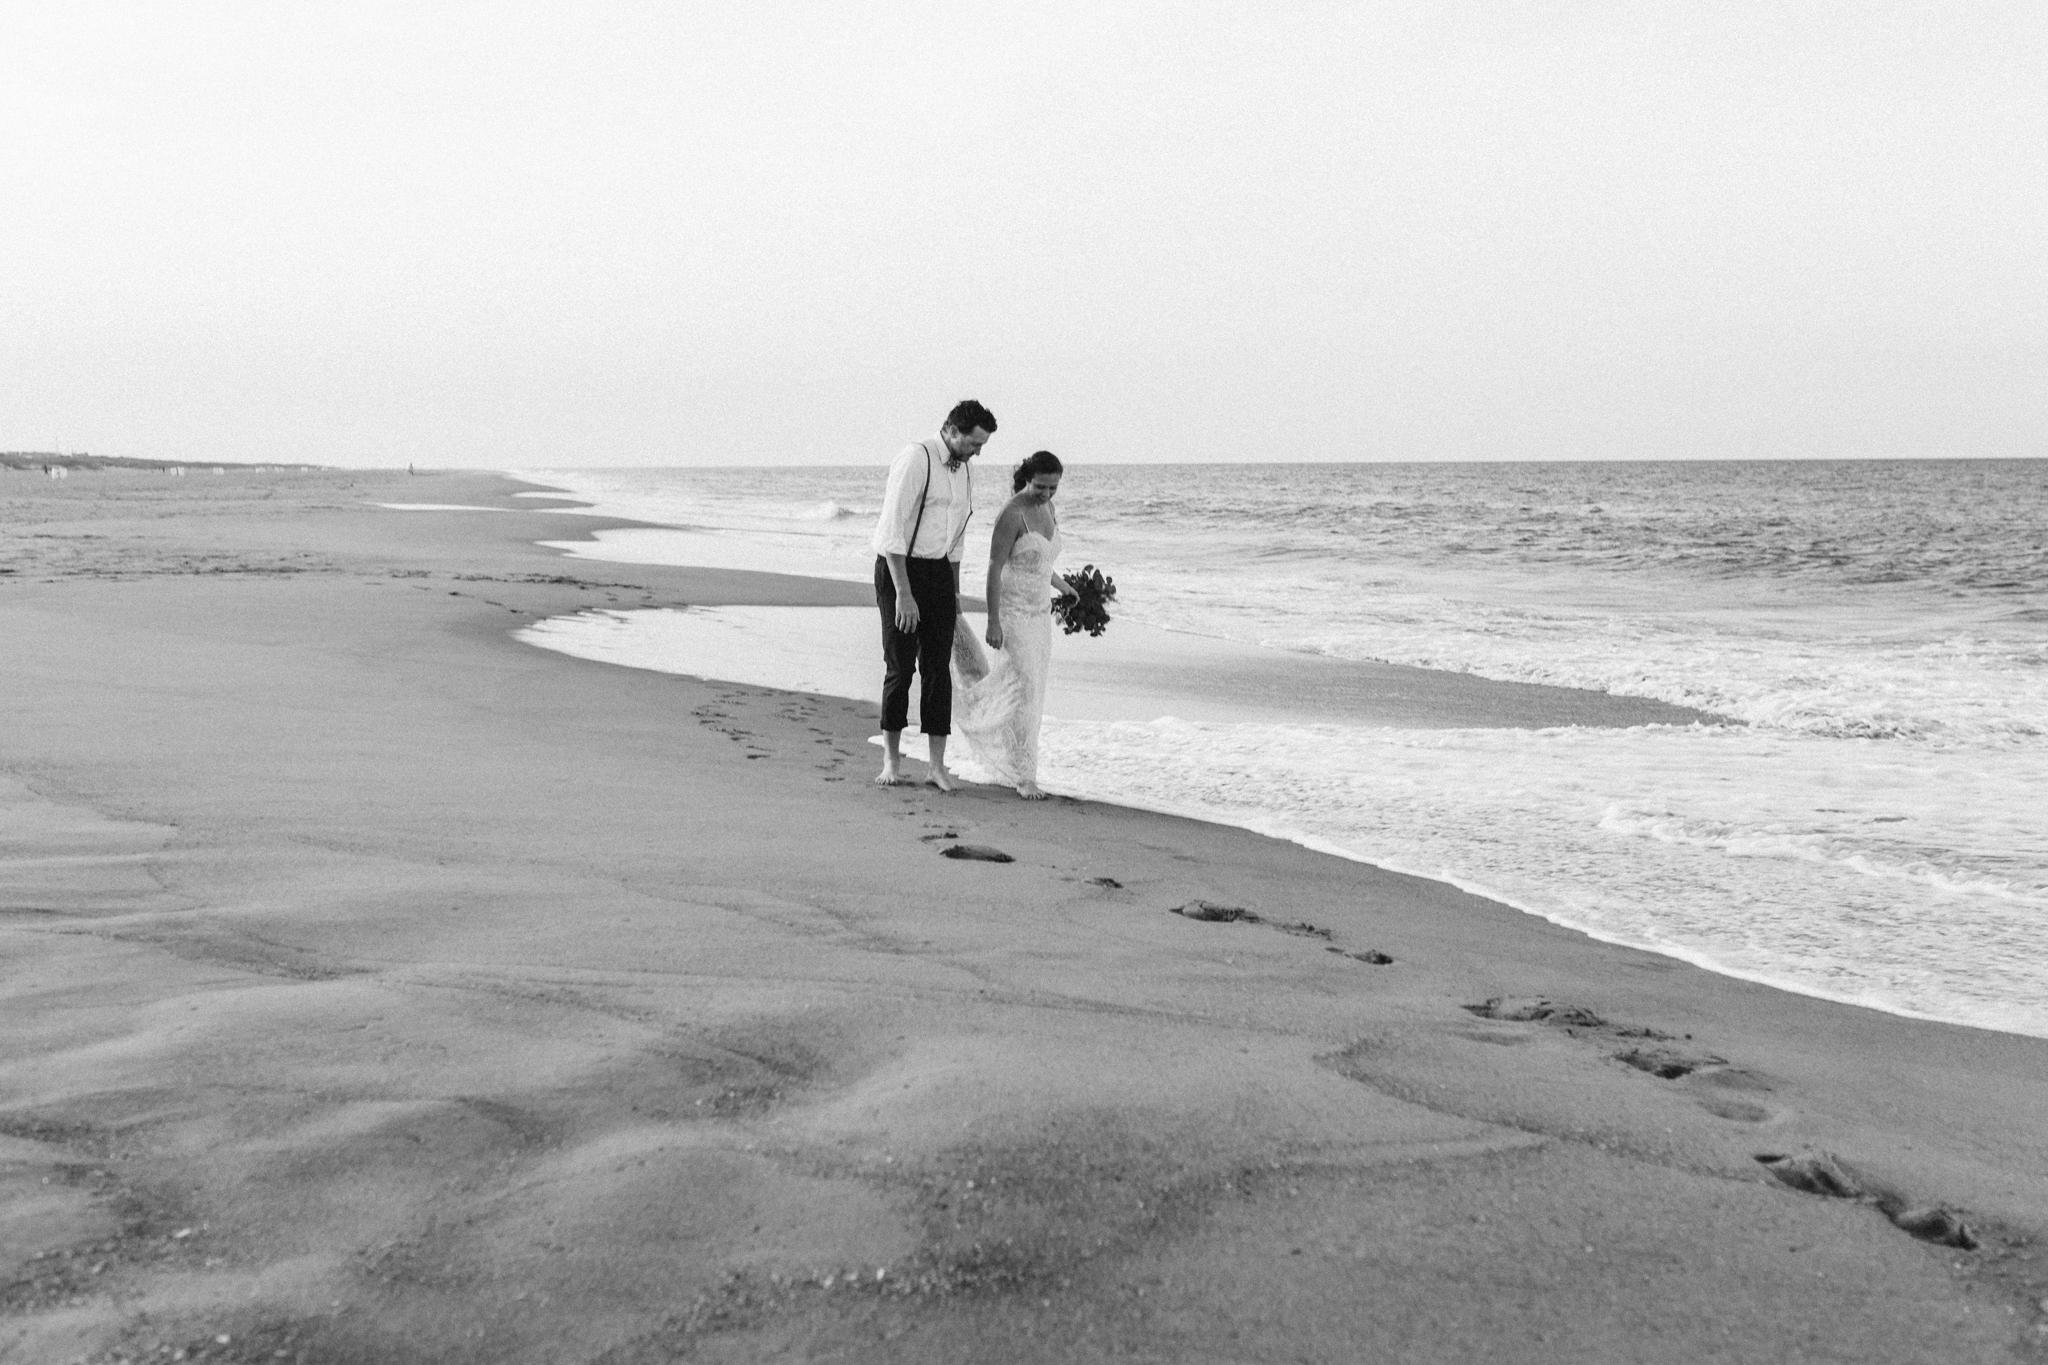 anniversary_virginia_beach_oceanfront_rebeccaburtphotography-49.jpg